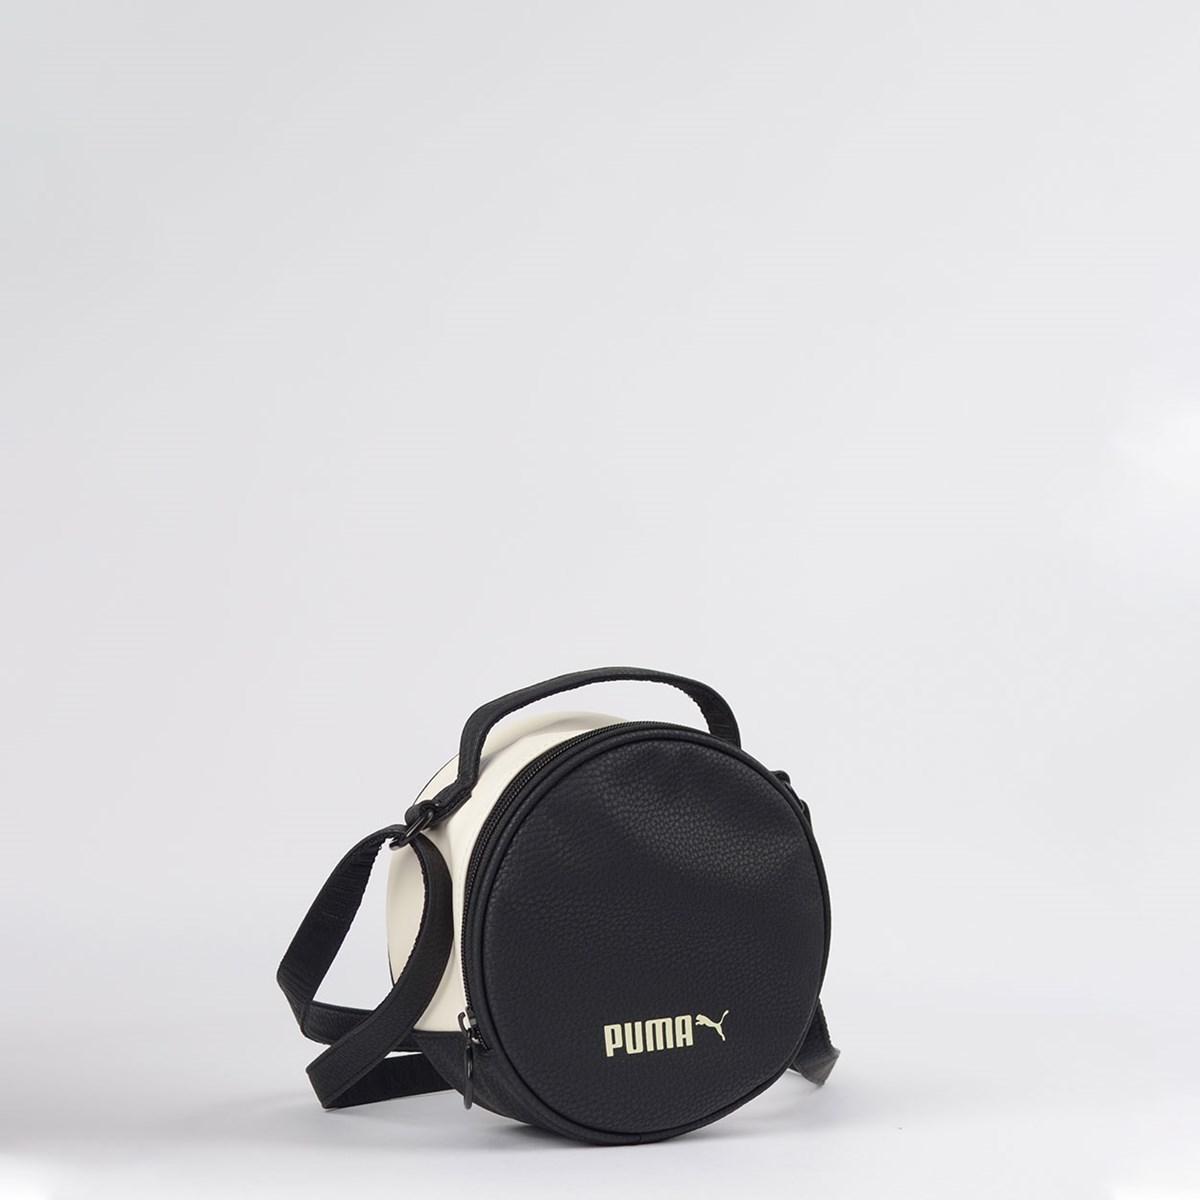 Bolsa Puma Prime Classic Round Case Black Whisper 07558601